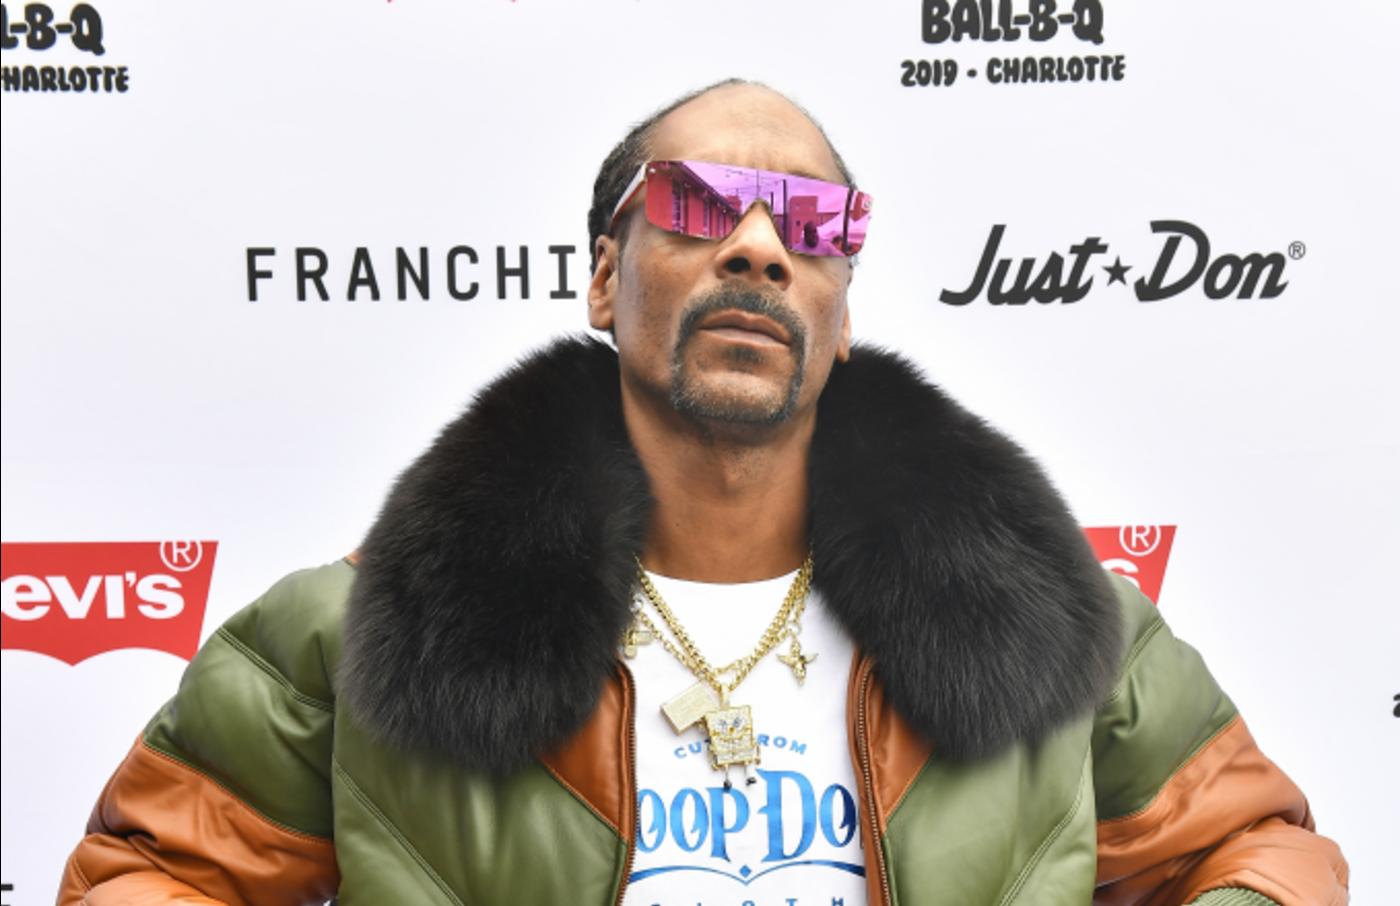 Rapper Snoop Dogg attends Levi's® All-Star Weekend Ball-B-Q